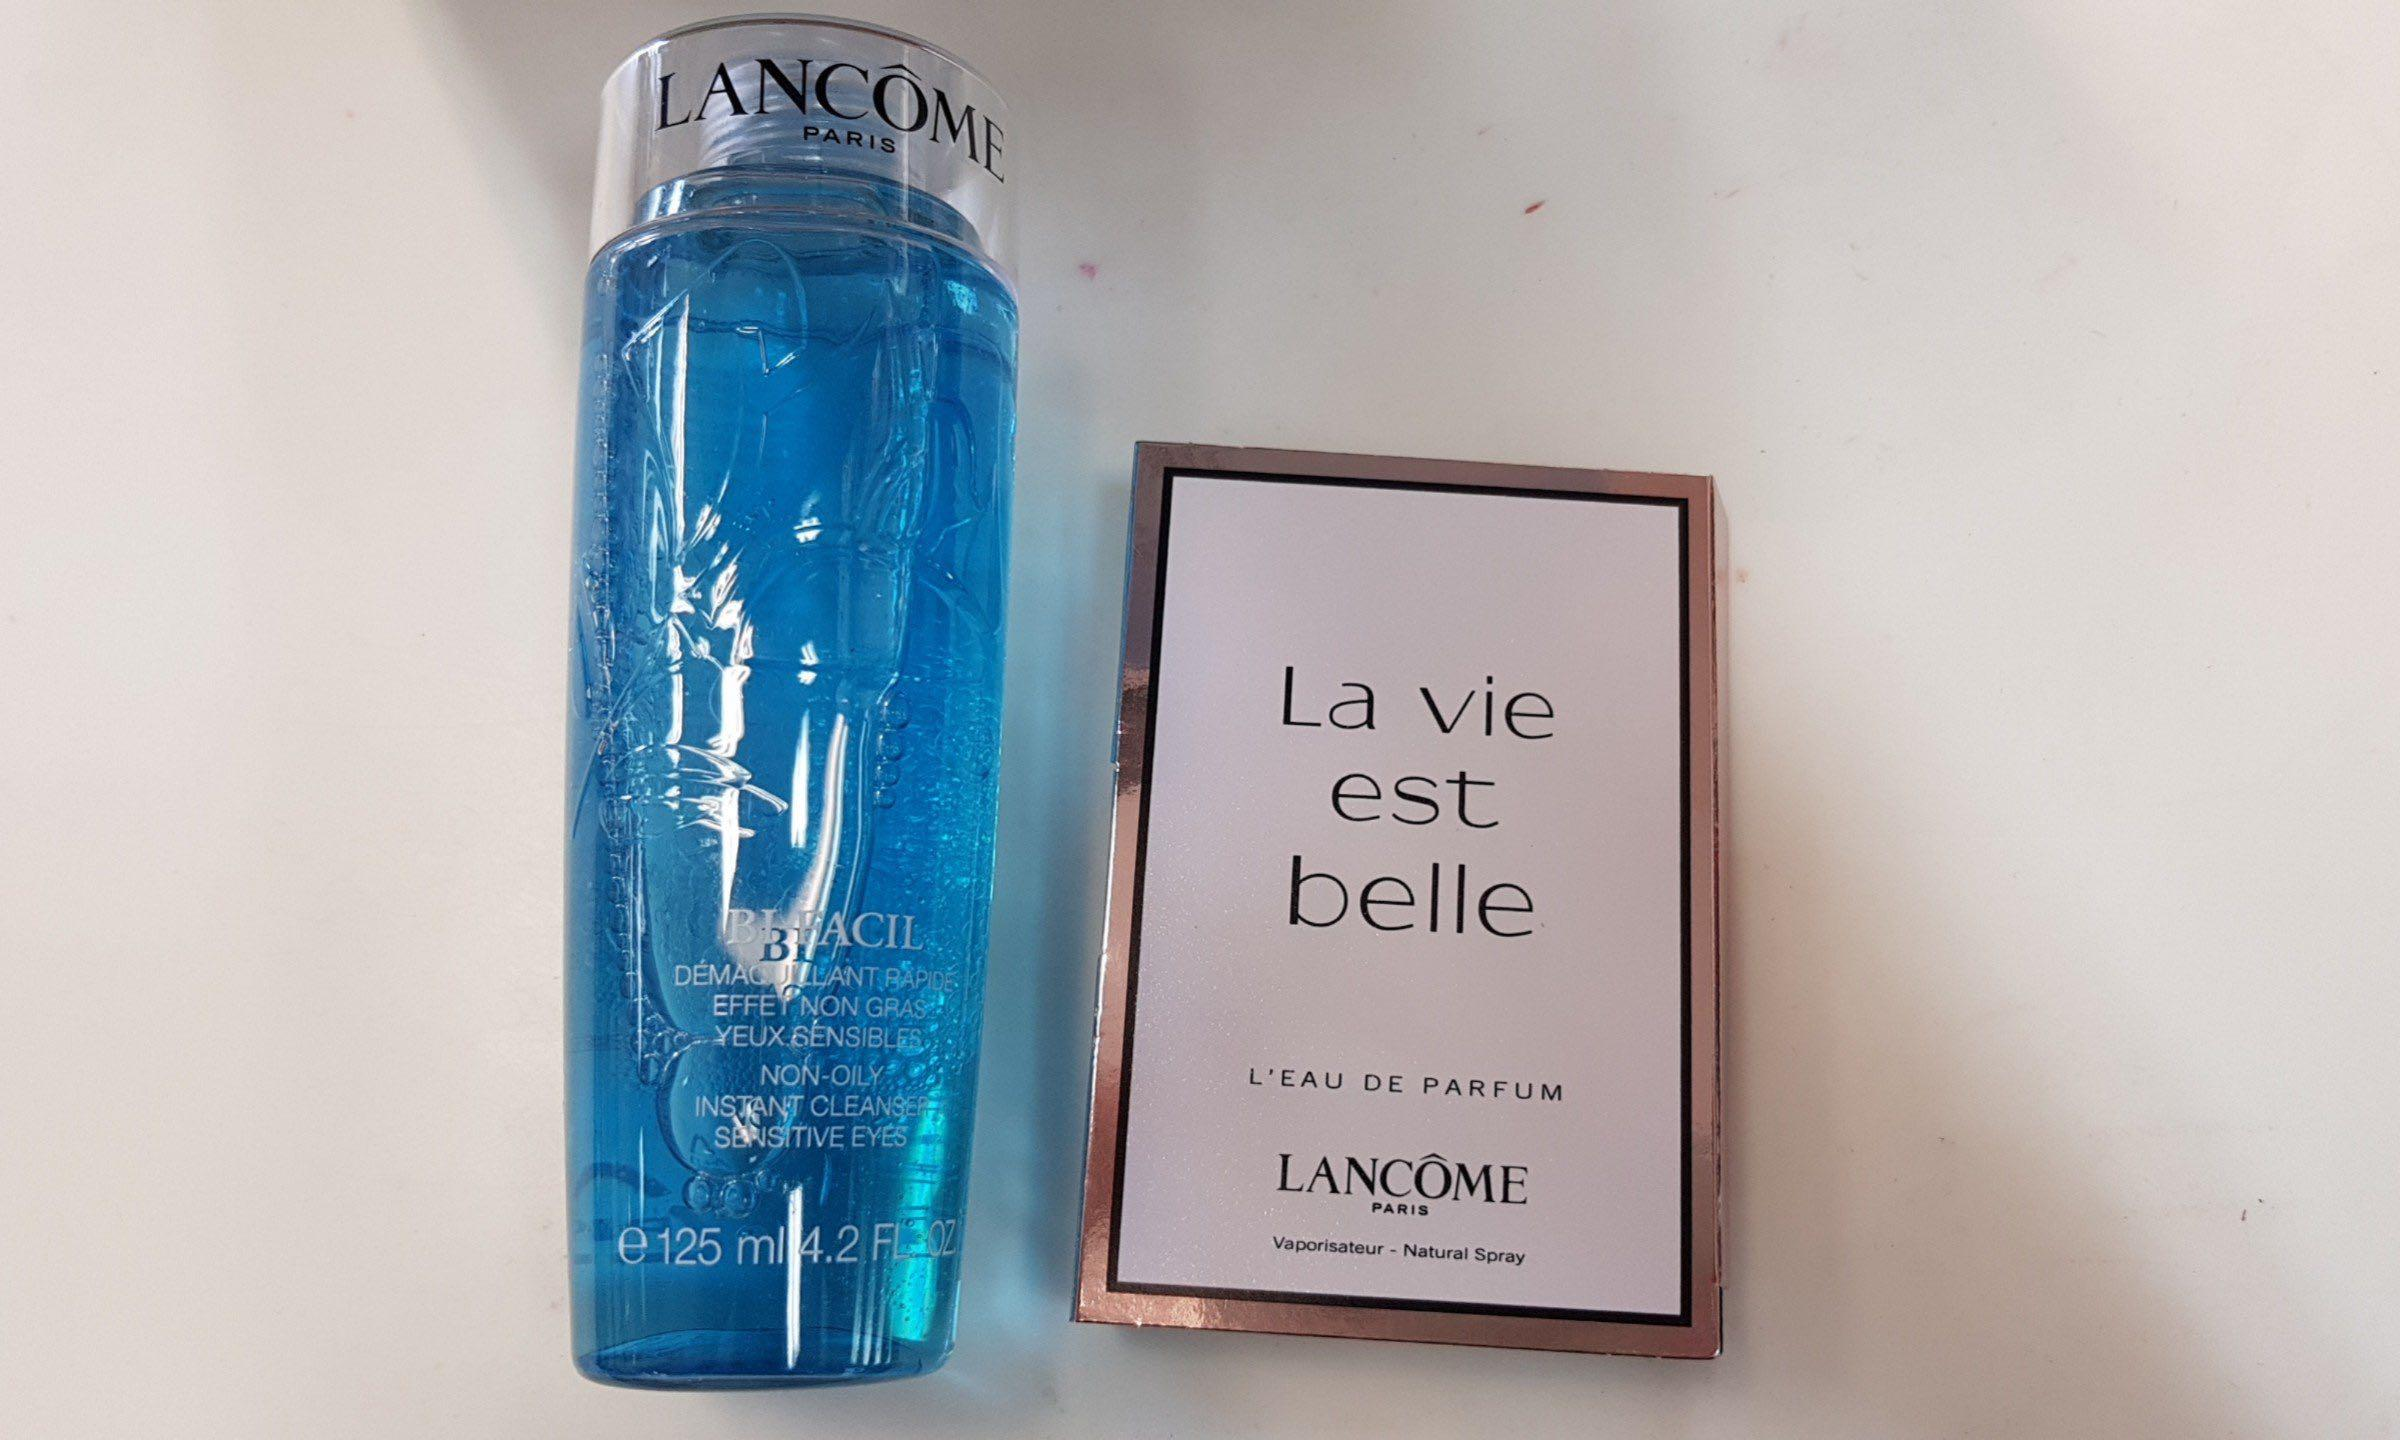 Lancome sensitive eye make up remover & mini La vie belle perfume